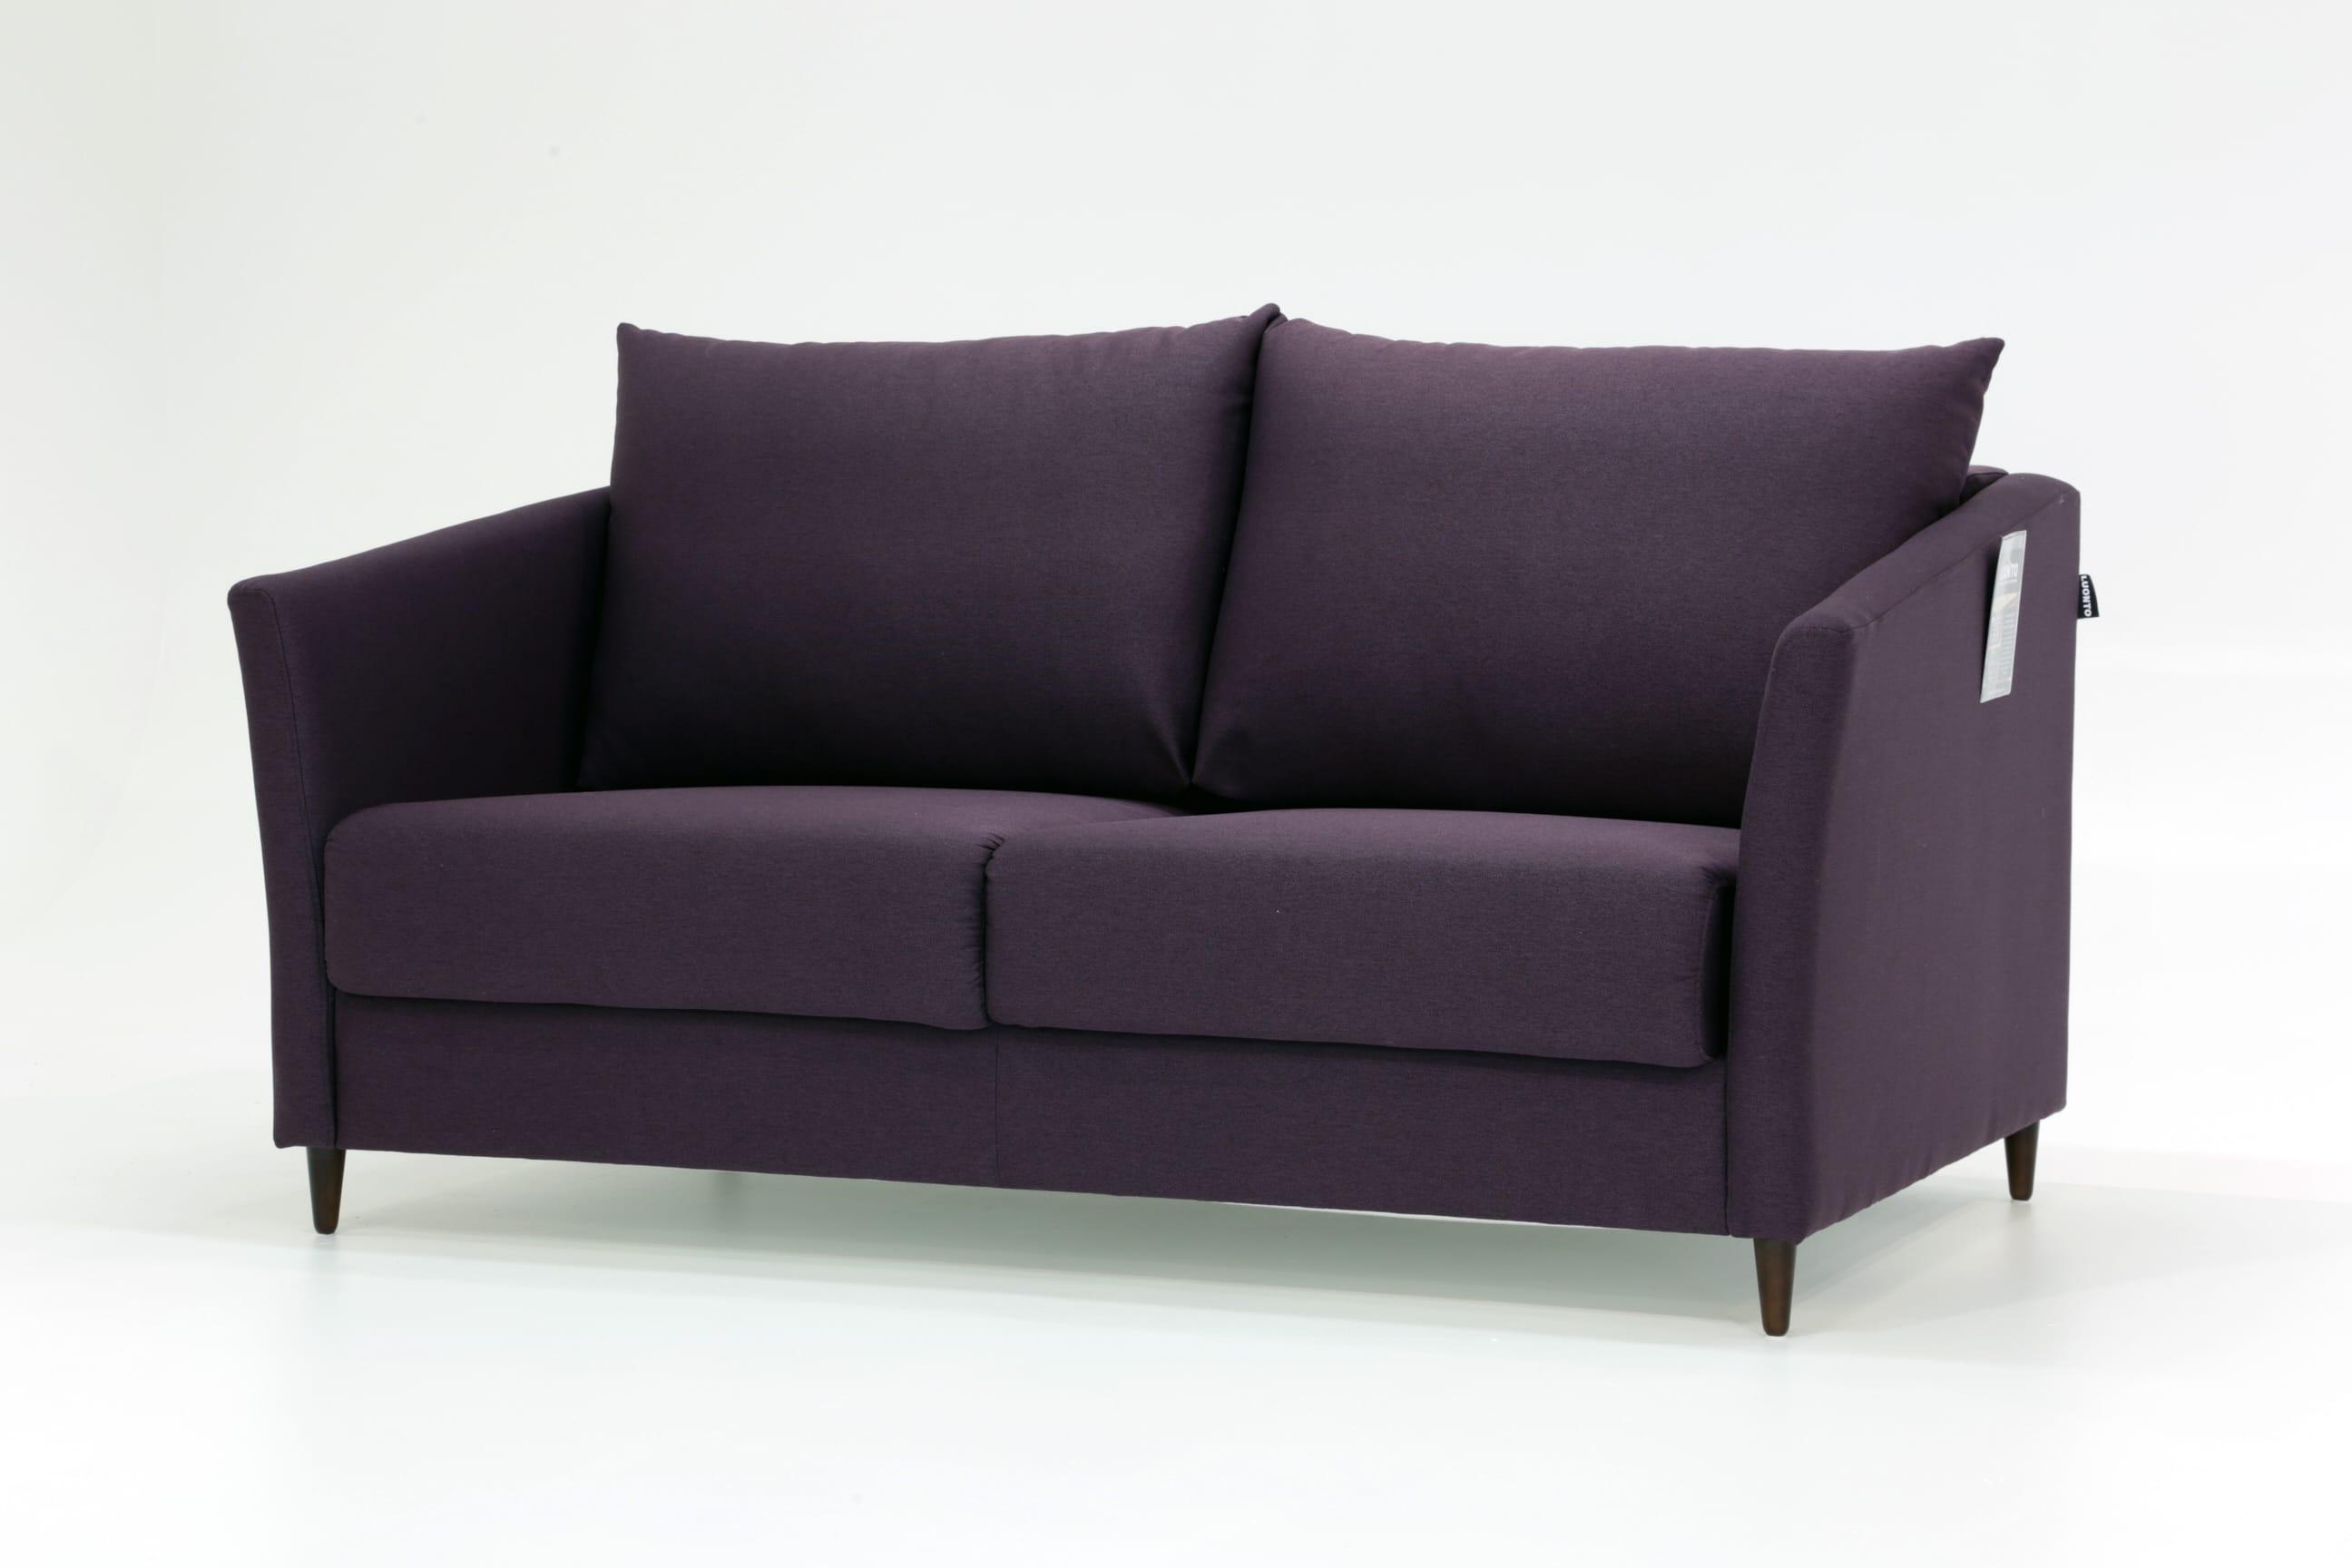 Terrific Floor Sample Erika Loveseat Full Sleeper Purple By Luonto Lamtechconsult Wood Chair Design Ideas Lamtechconsultcom